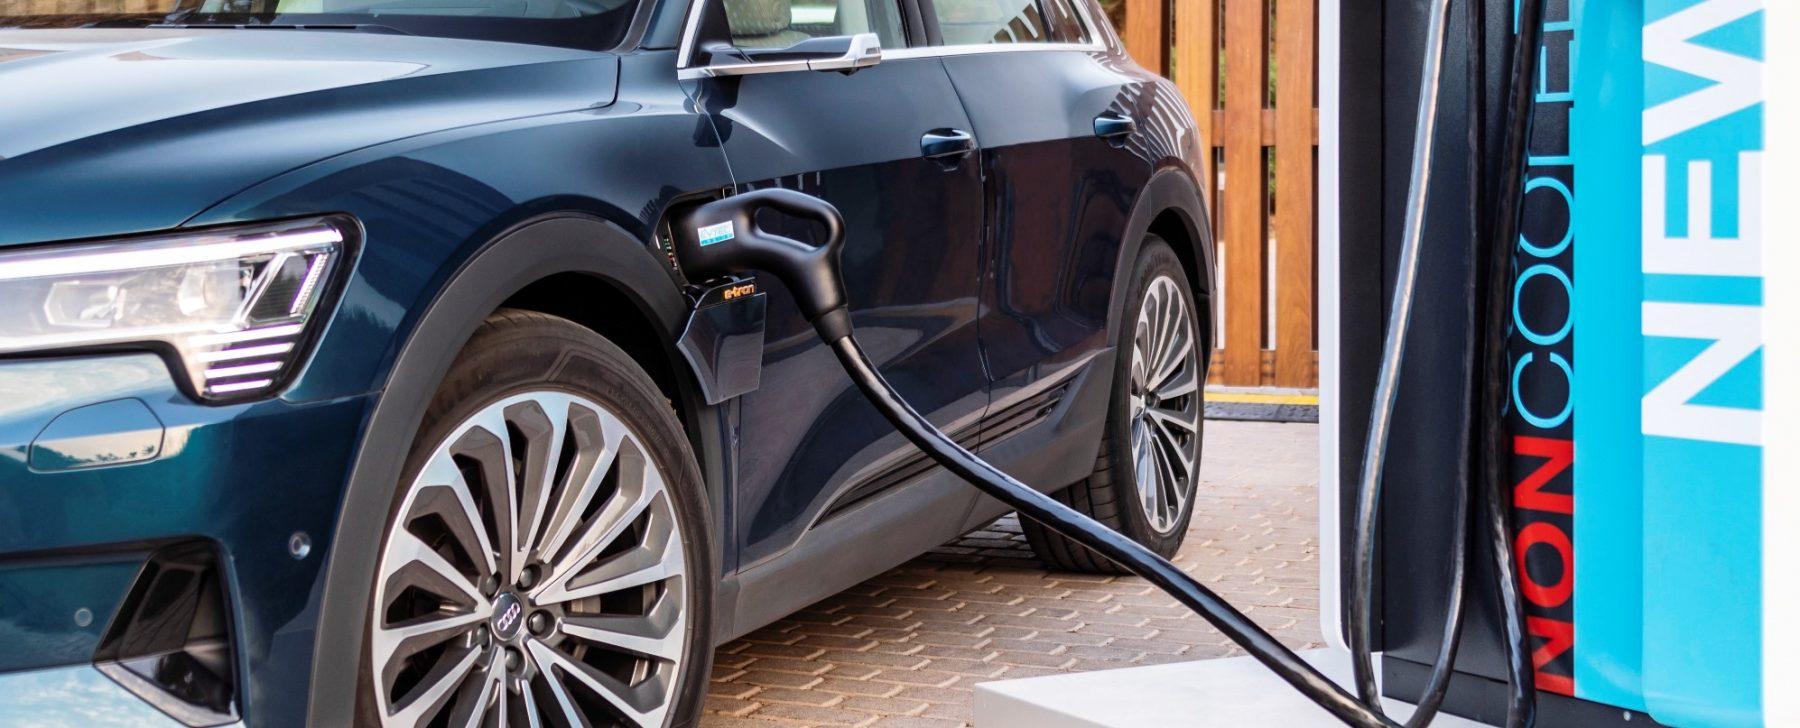 Combustible para coches